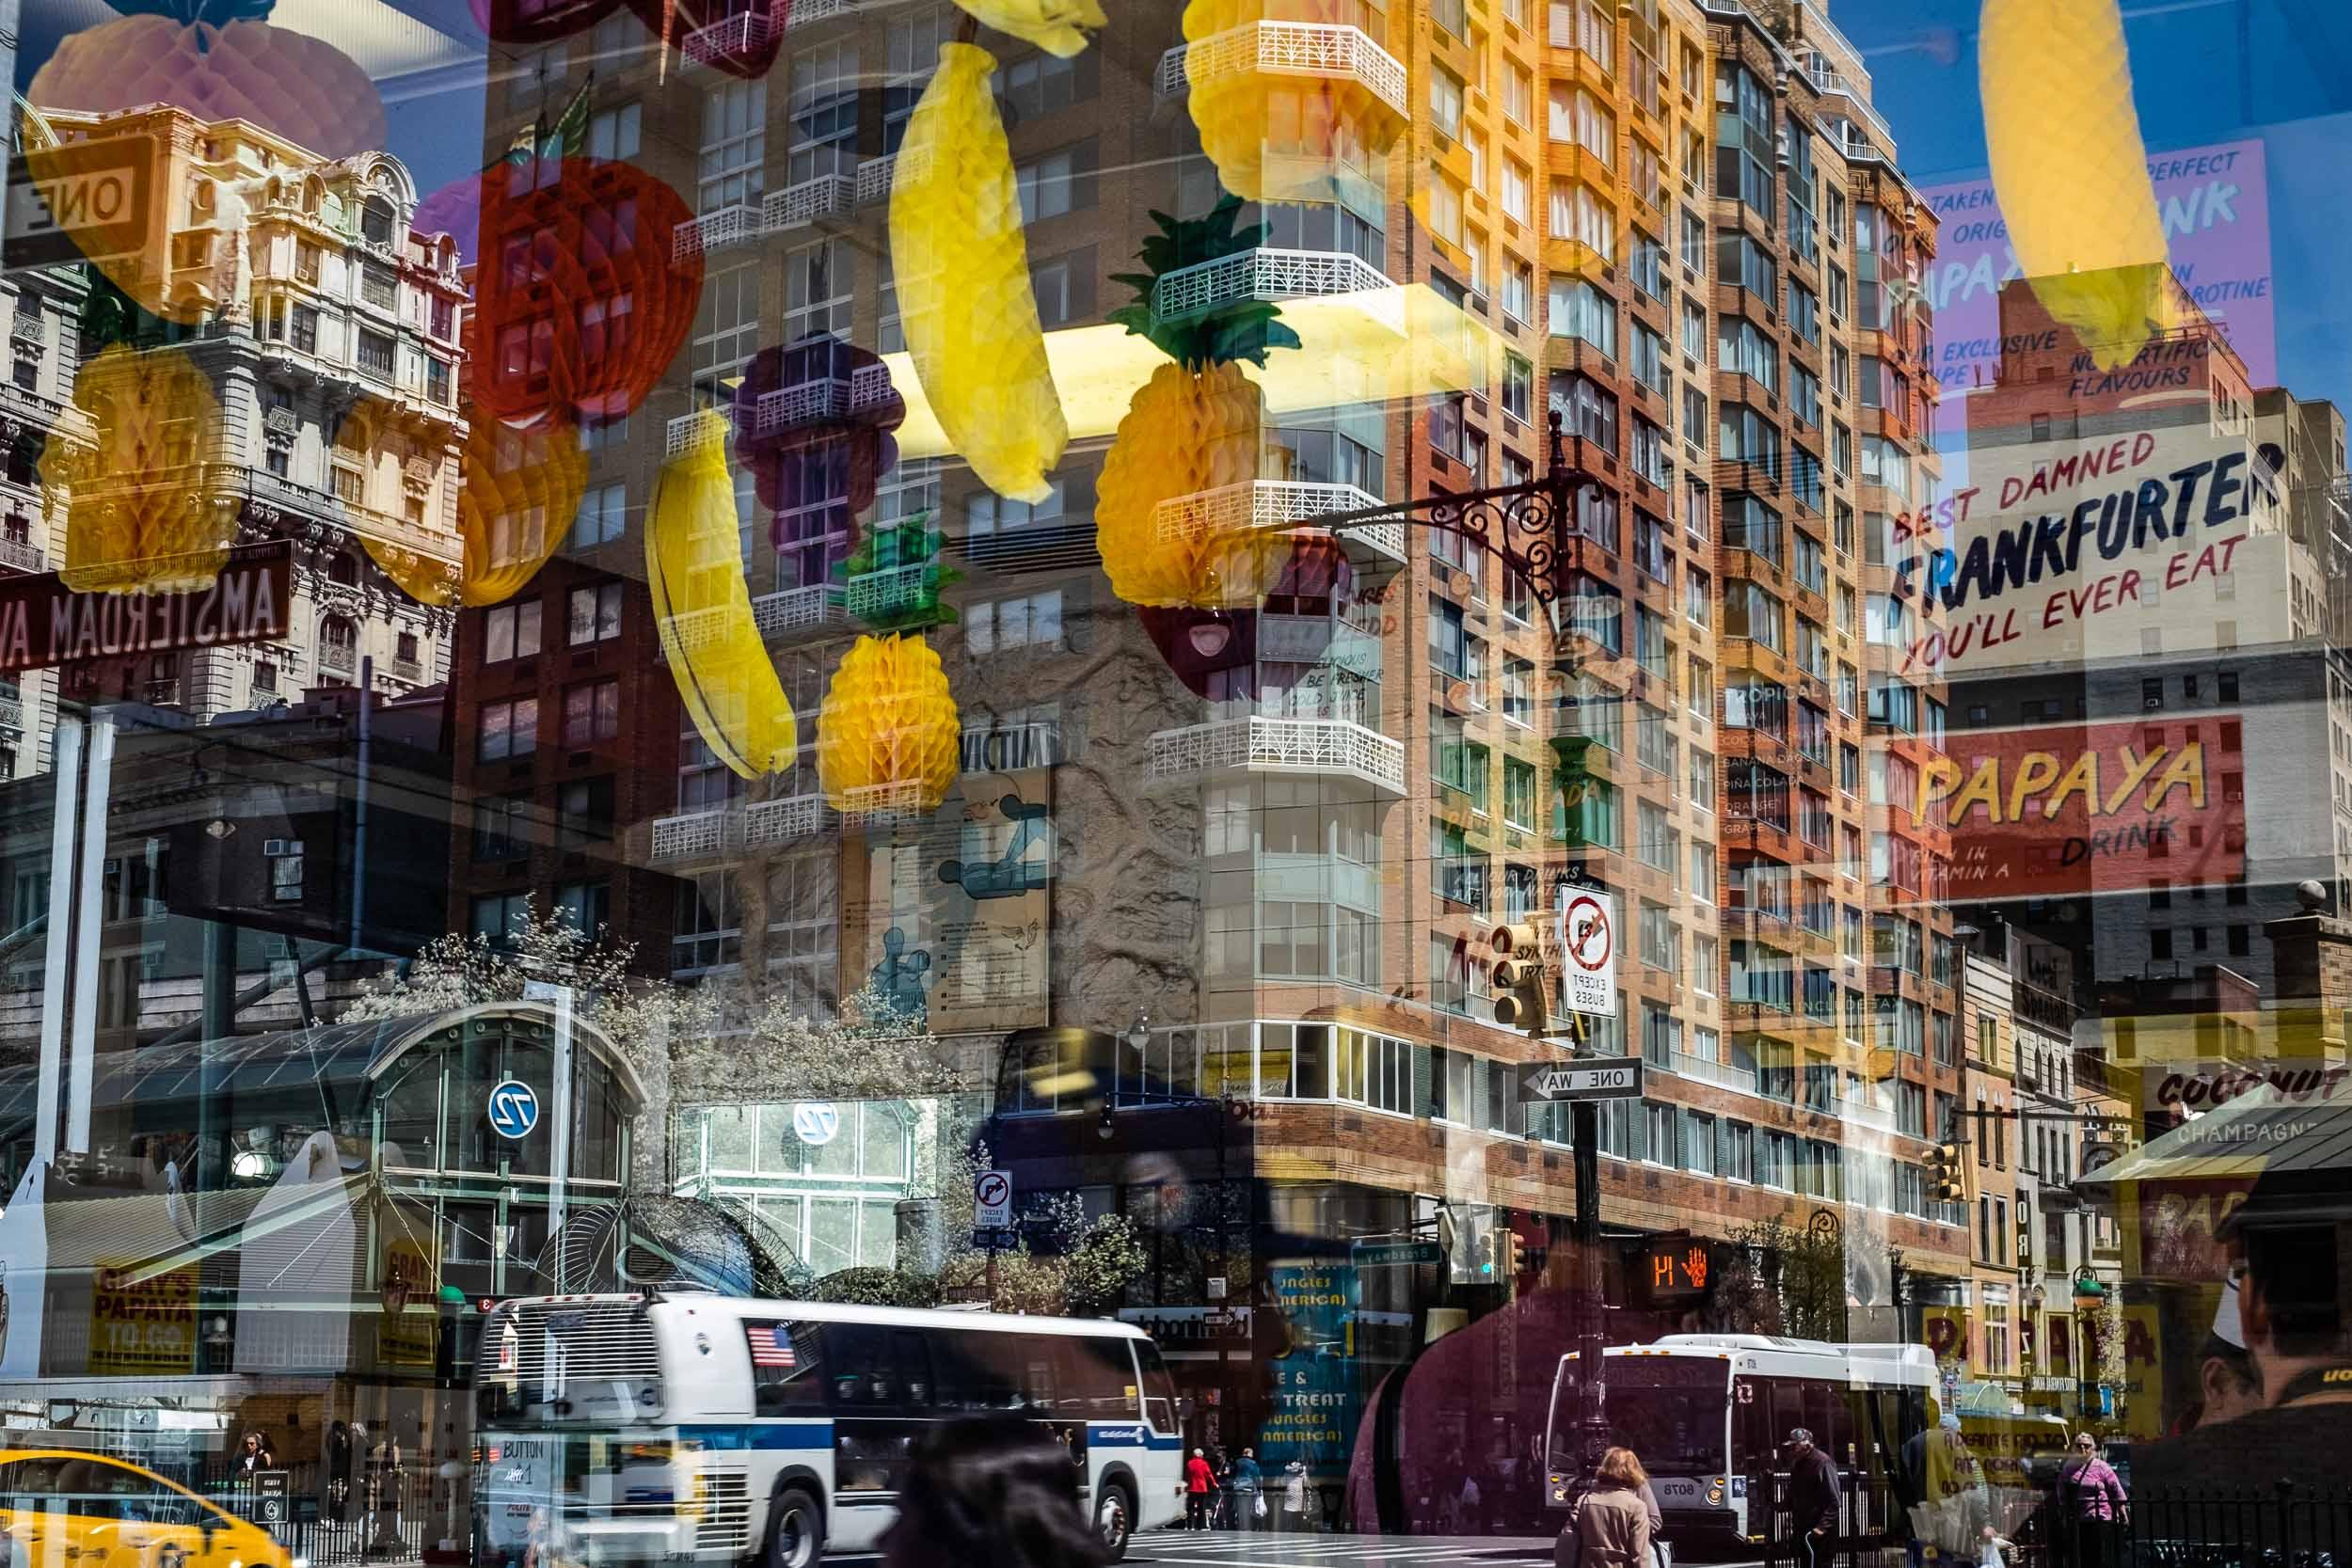 72ND & AMSTERDAM, New York City